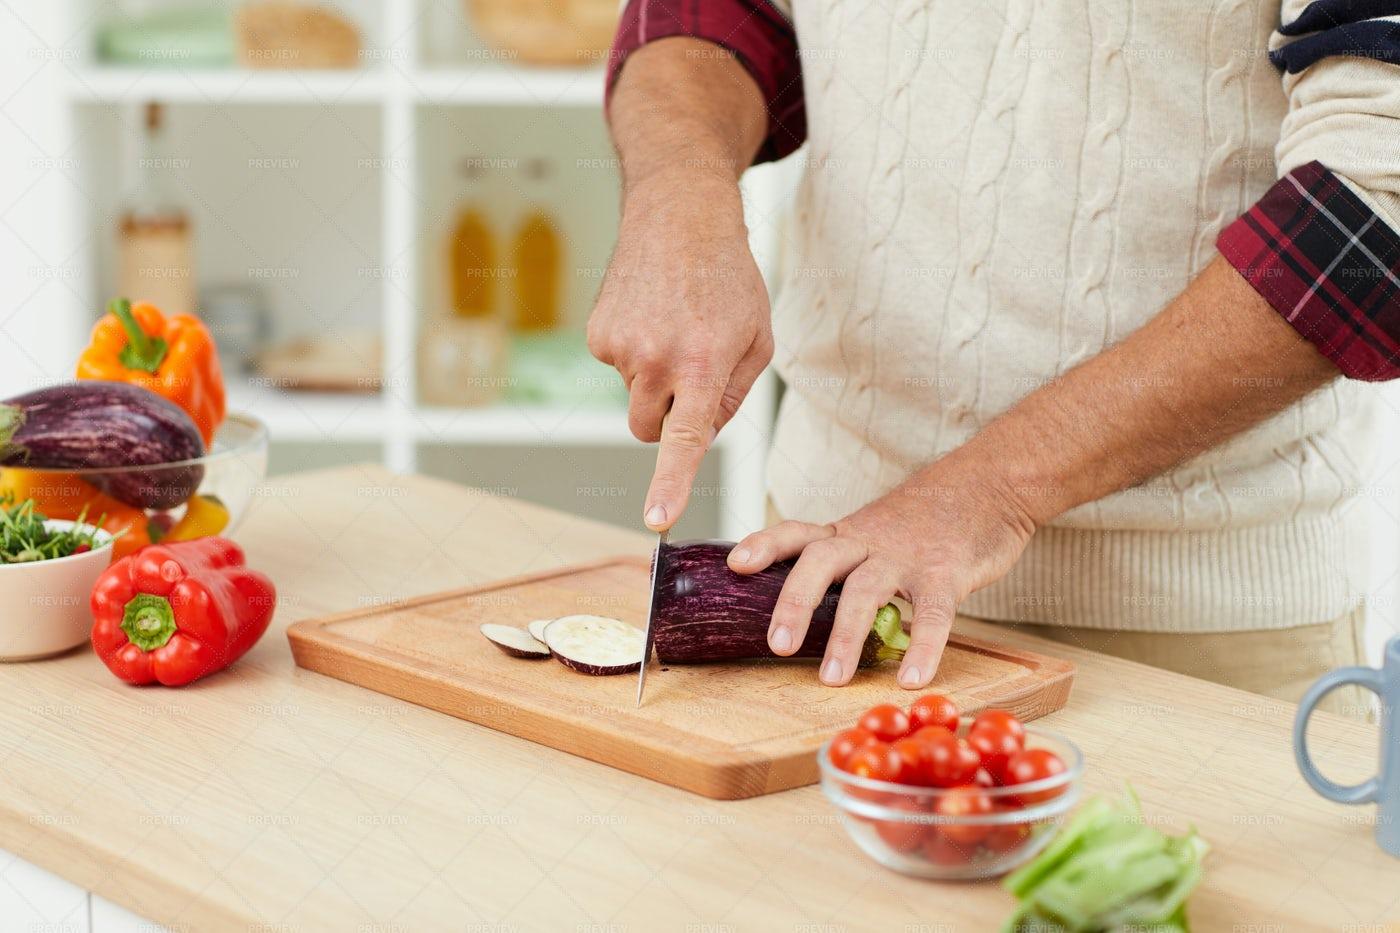 Senior Man Cutting Vegetables: Stock Photos